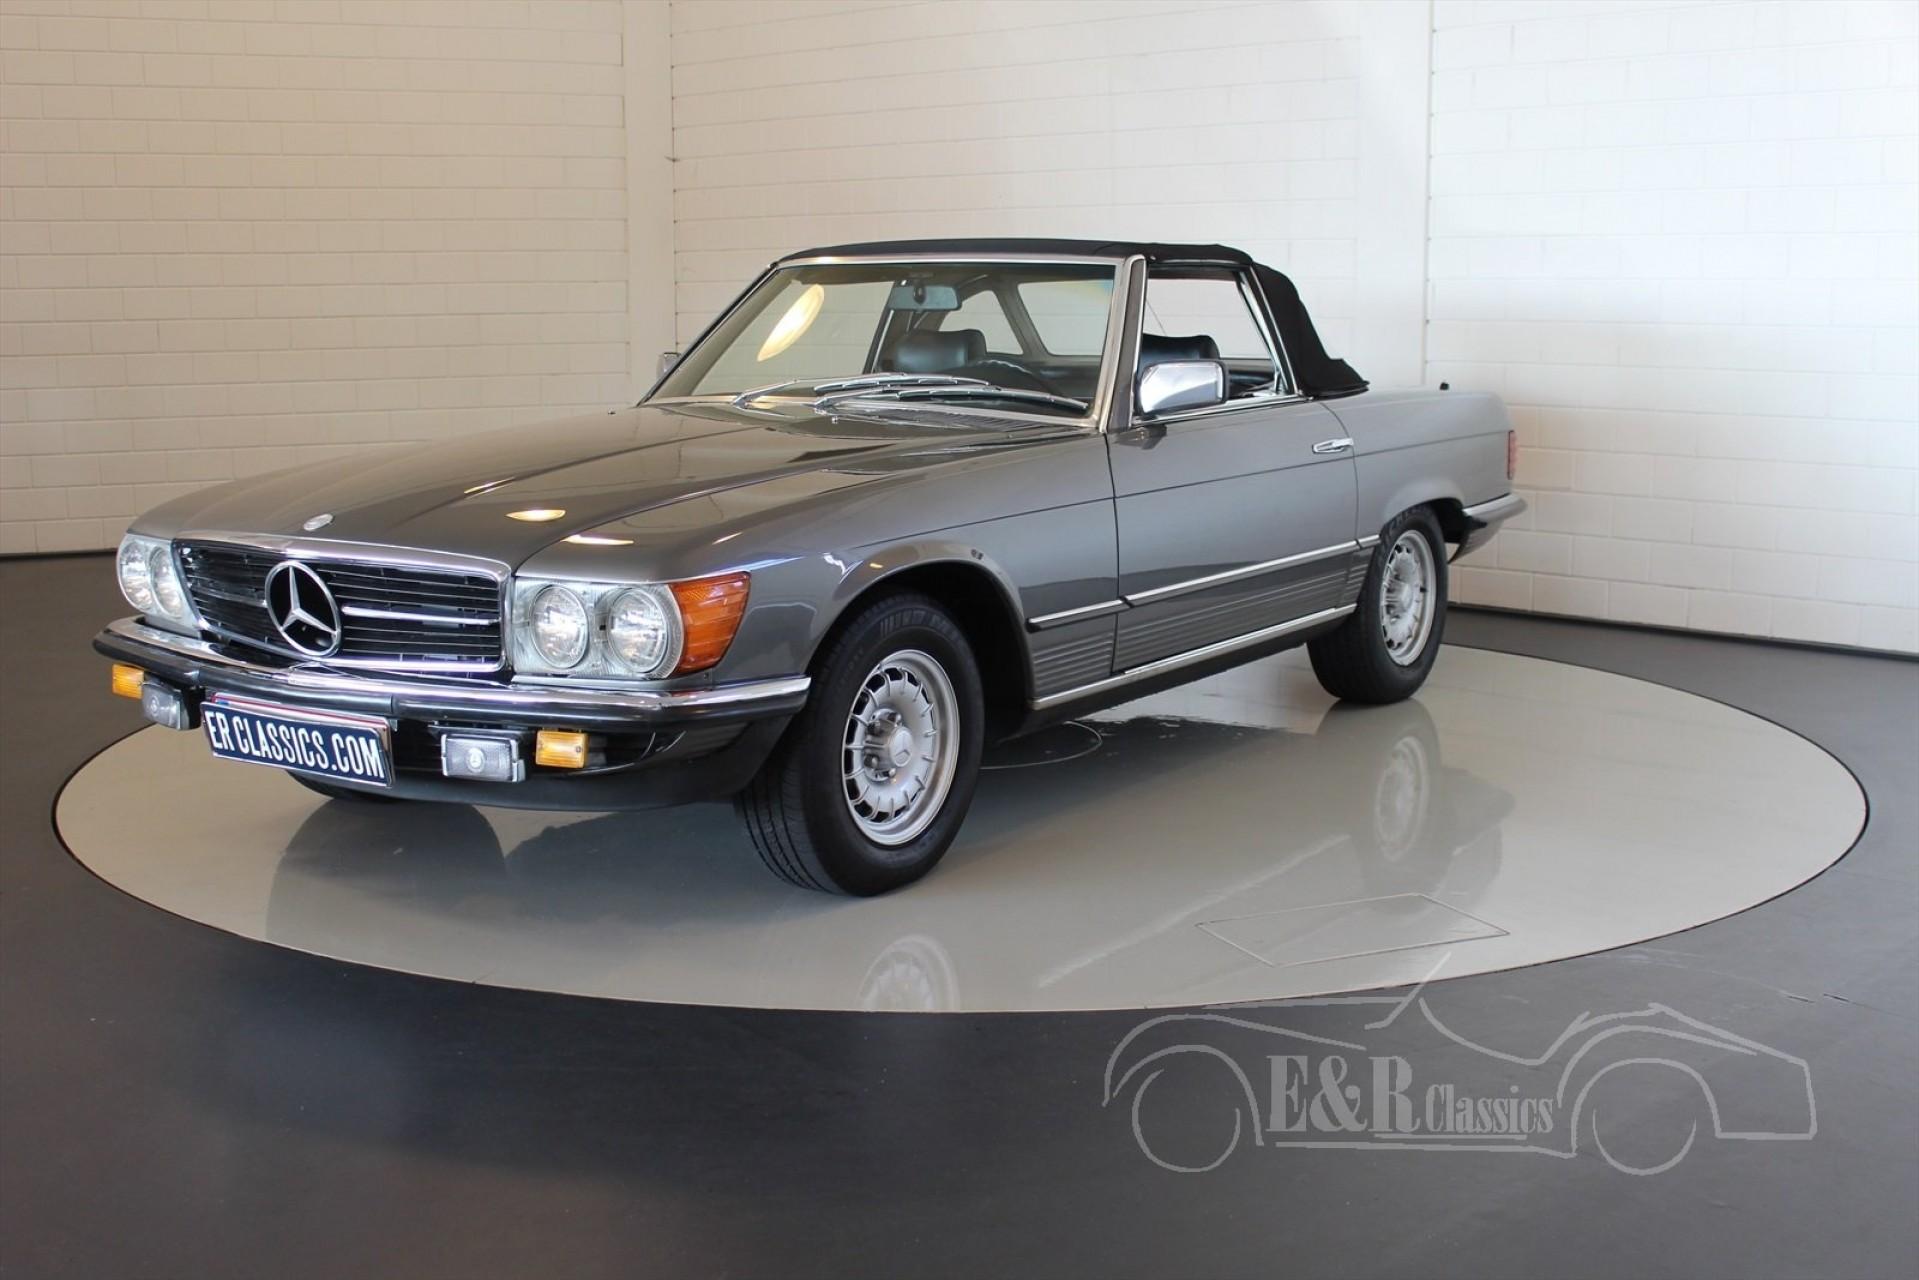 Mercedes benz sl 280 cabriolet 1980 vendre erclassics for Mercedes benz lifestyle collection